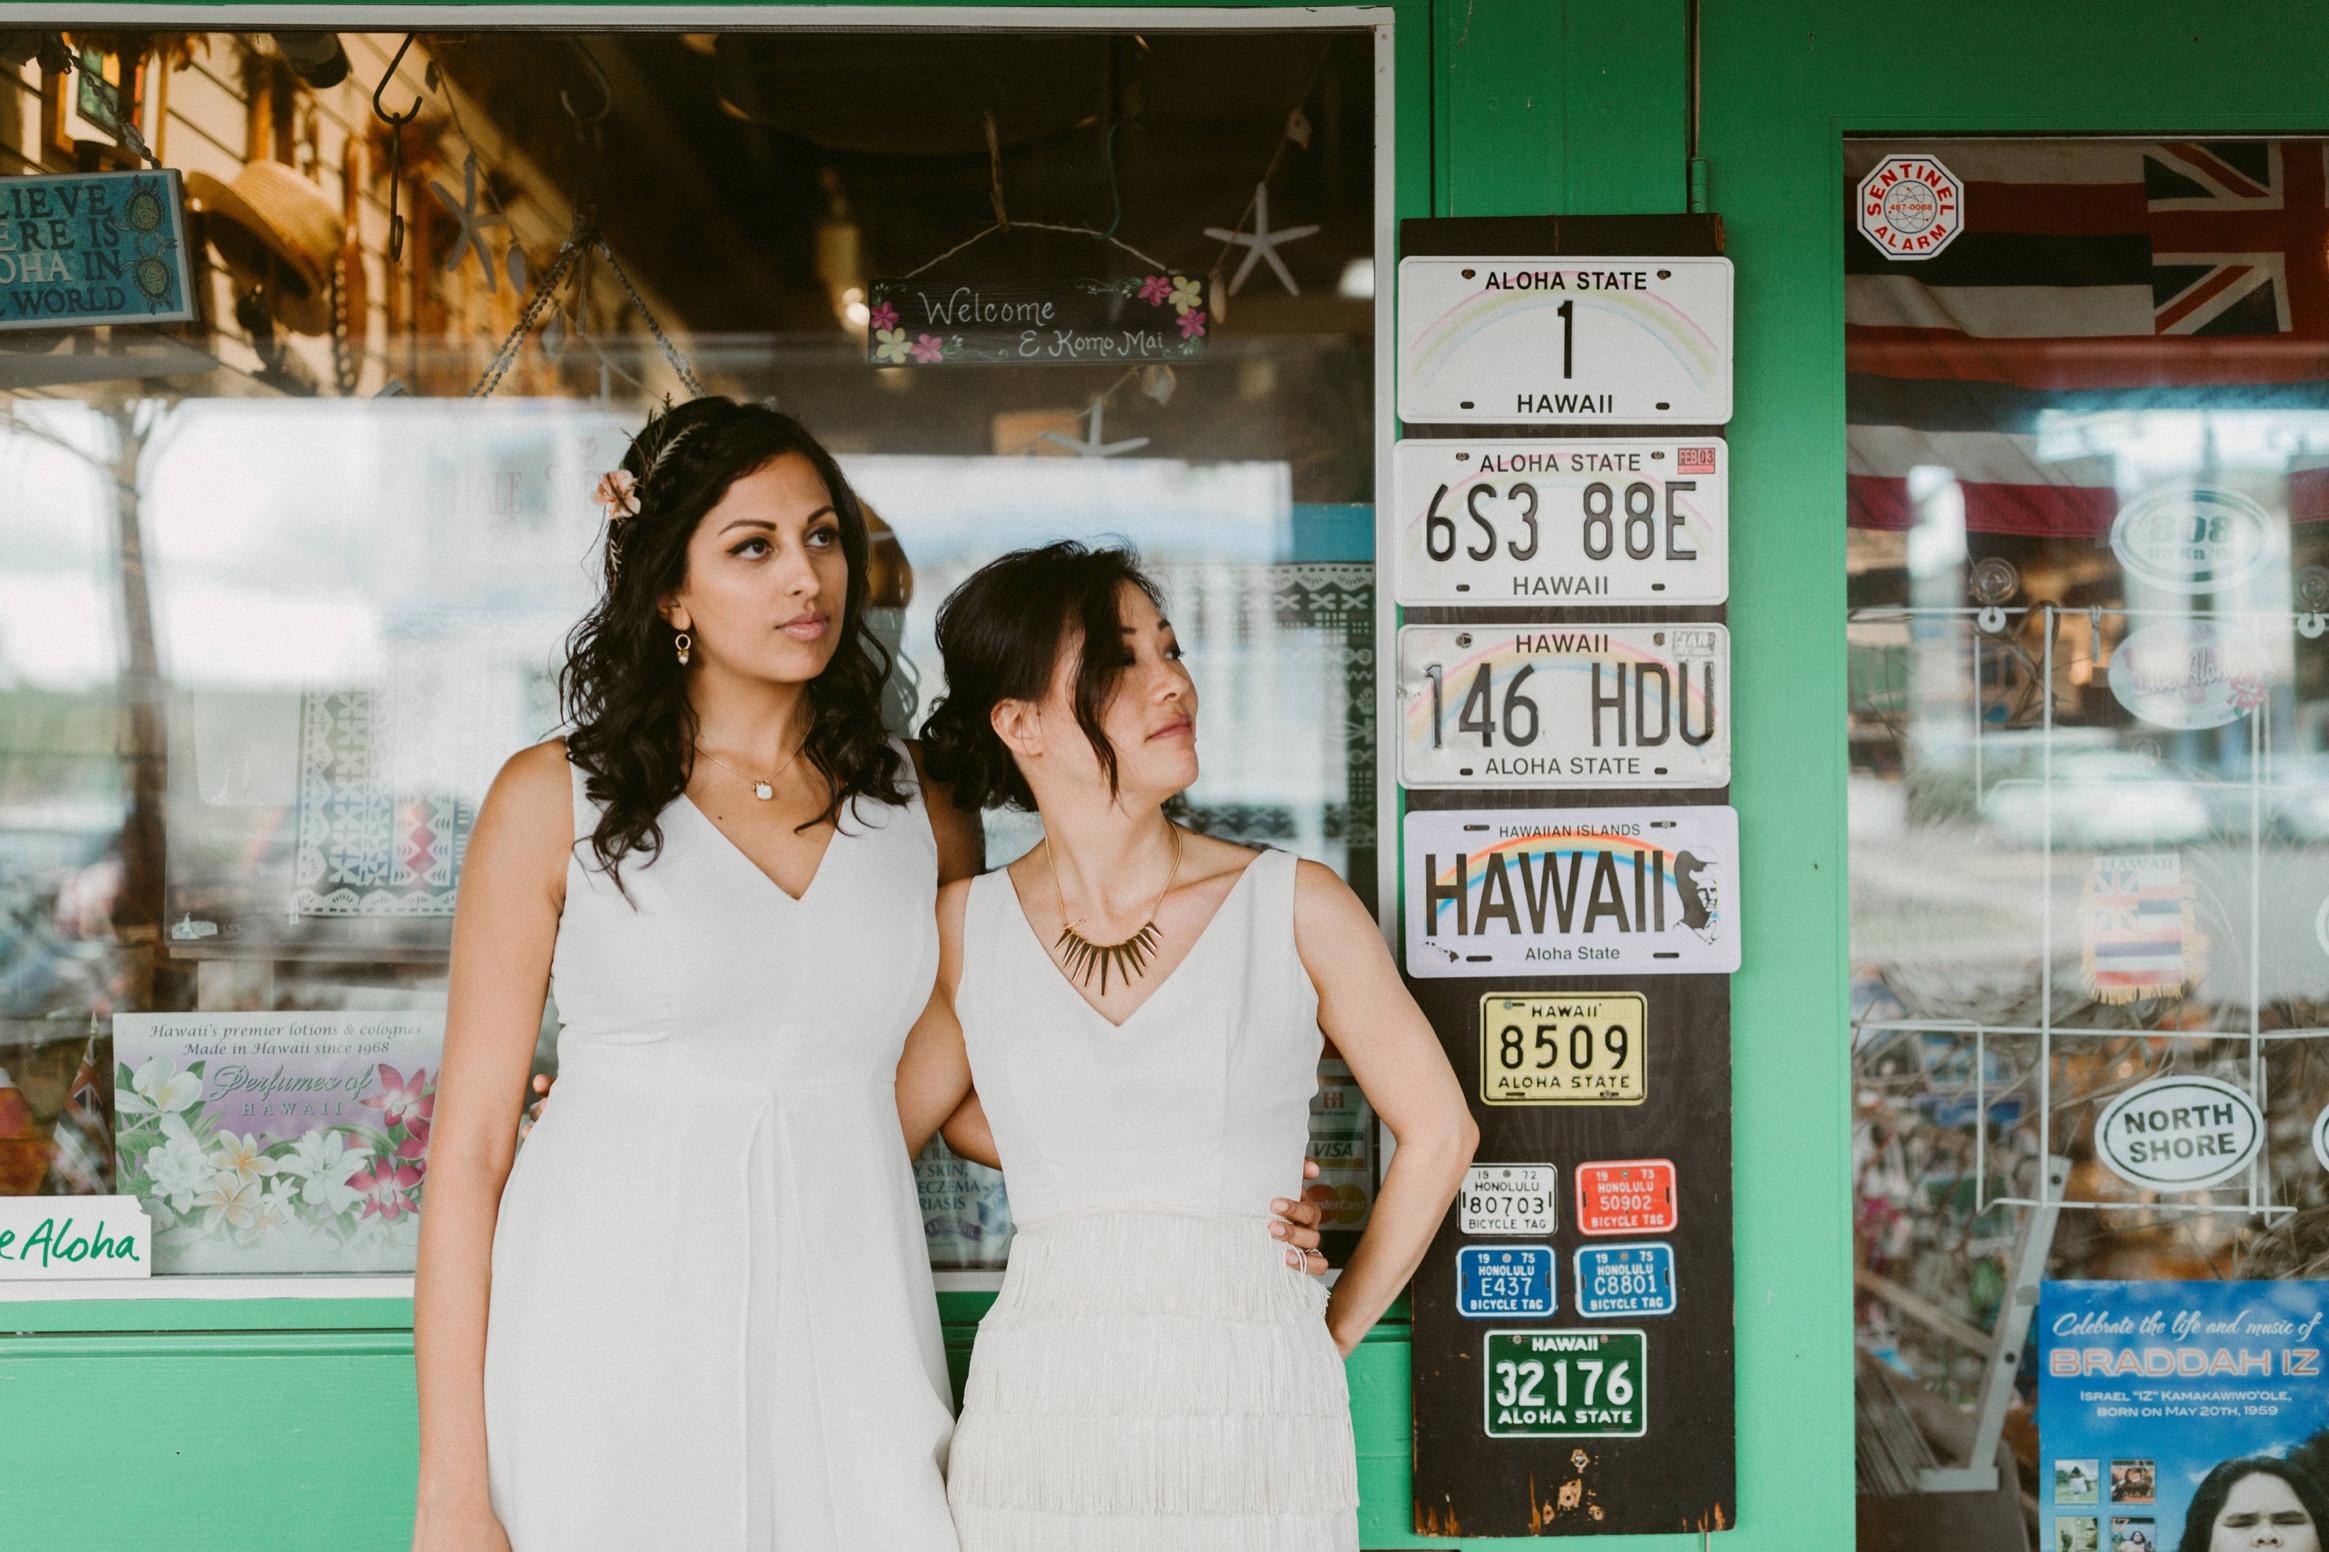 47_Oahu Hawaii Wedding  (193 of 294)_Oahu_sex_Hawaii_same_wedding_elopement_photographer.jpg